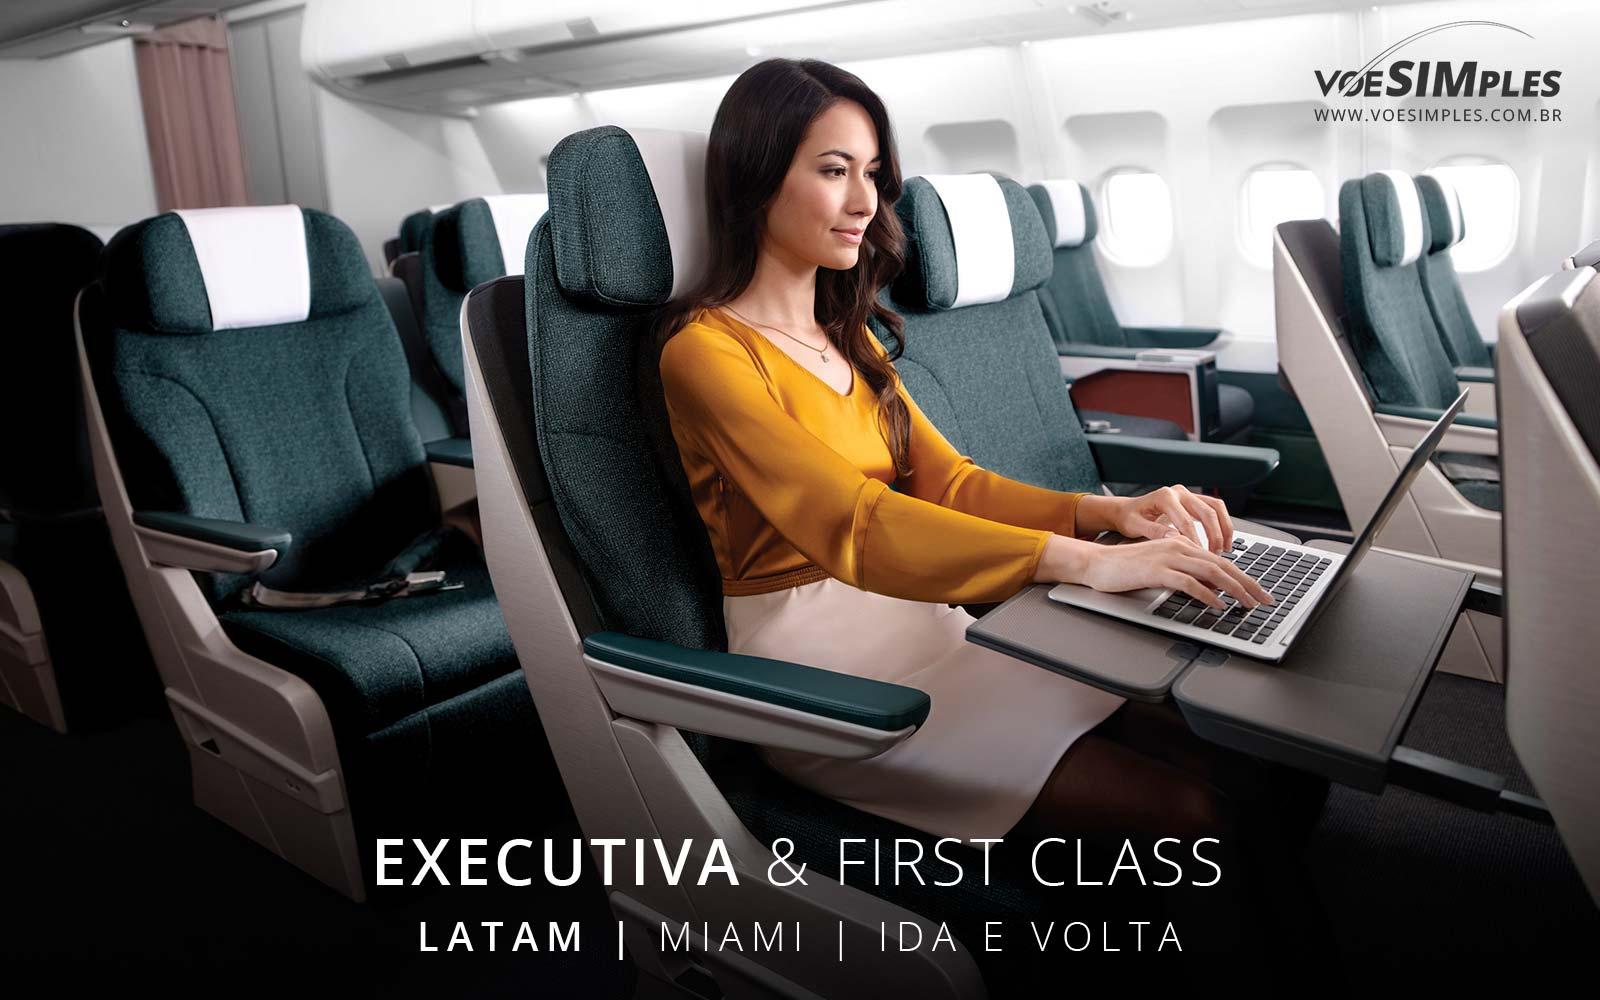 Passagem aérea Latam Executiva